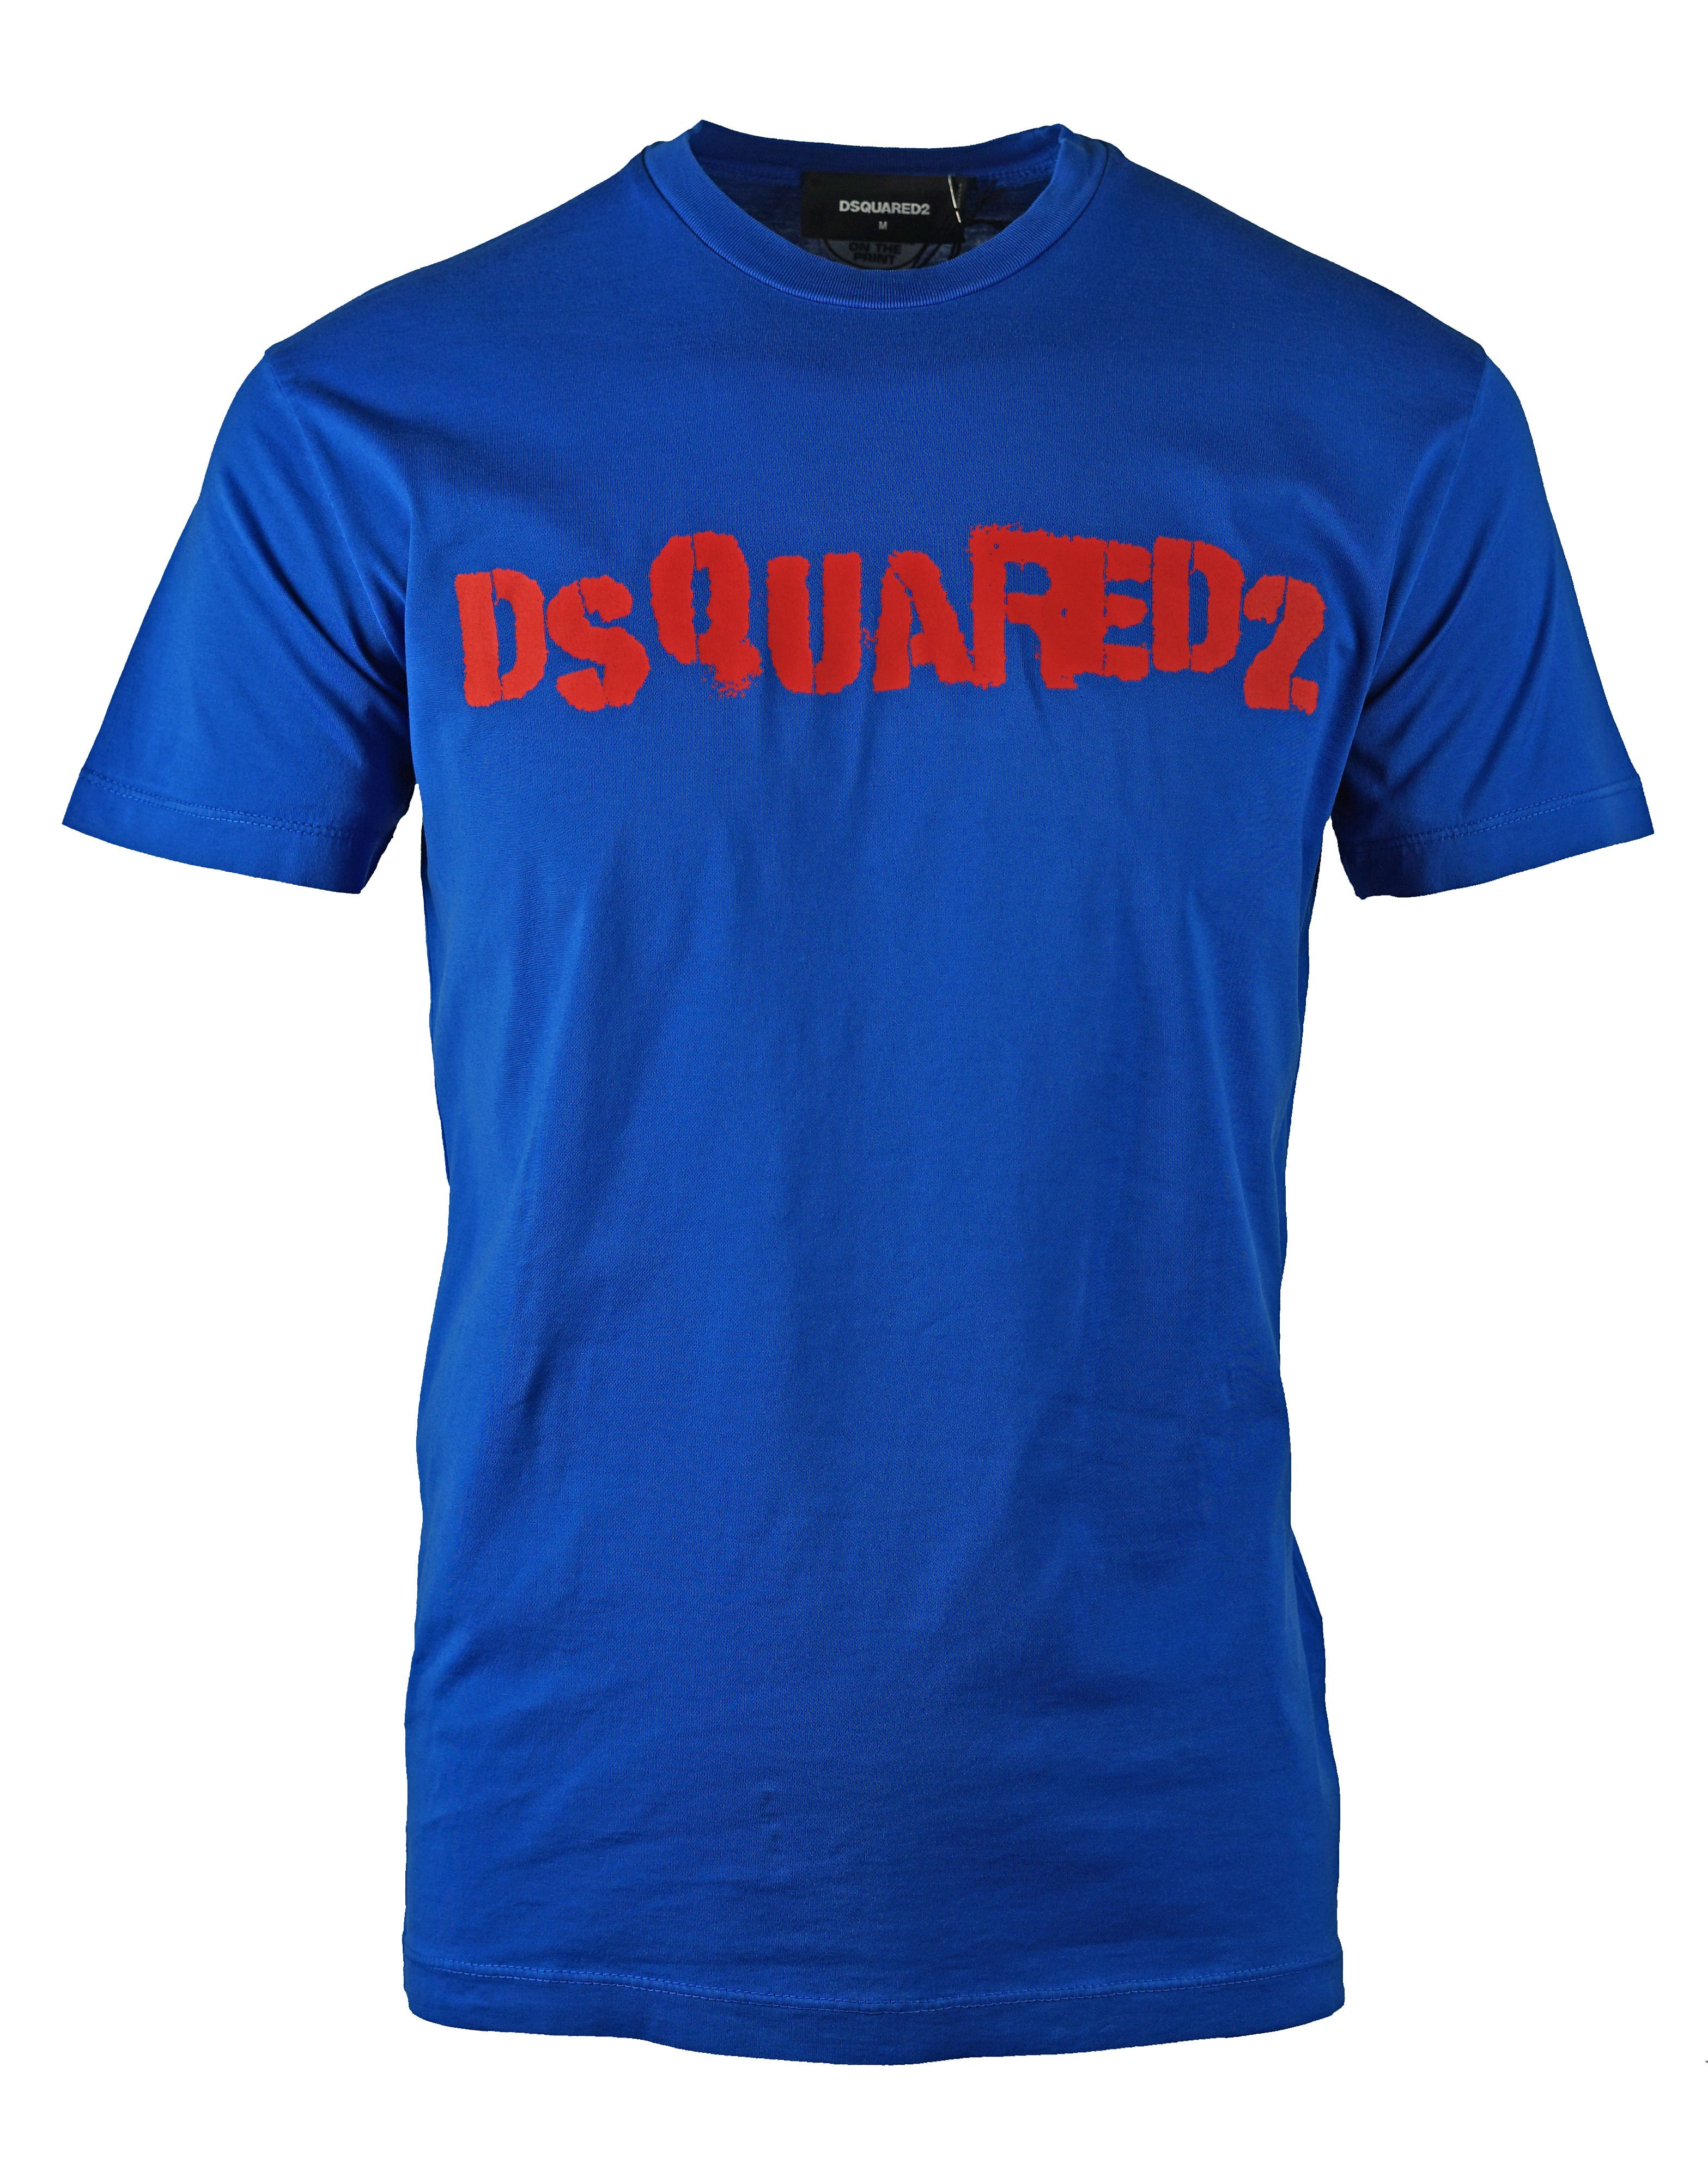 DSquared2 S74GD0494 S22427 476 T-Shirt